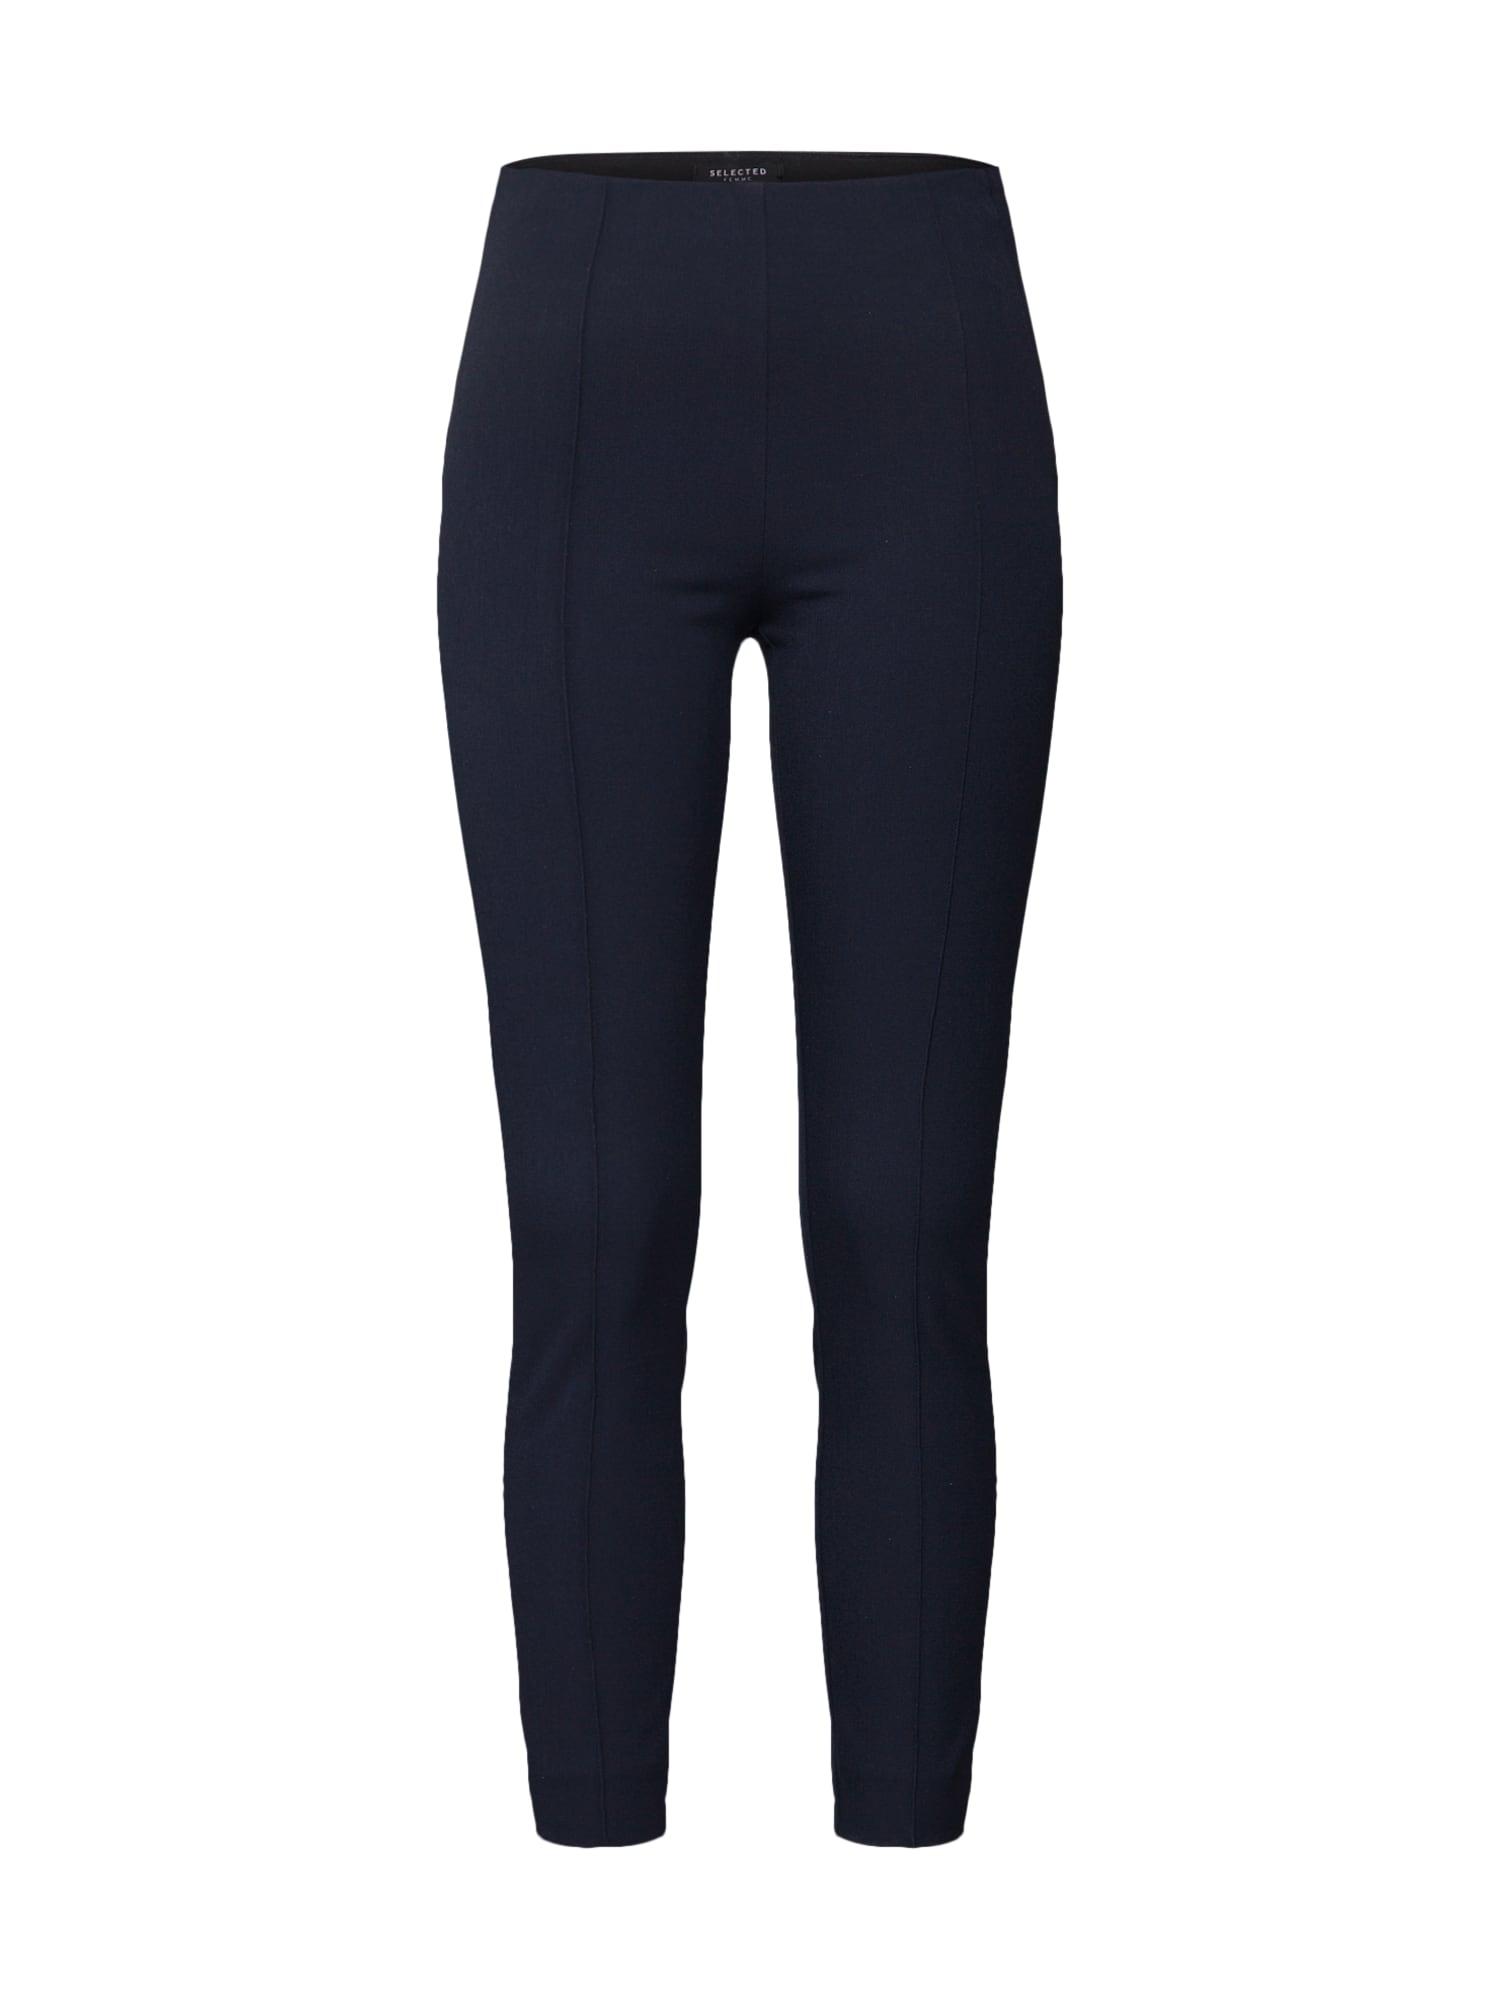 Kalhoty Pintuck tmavě modrá SELECTED FEMME